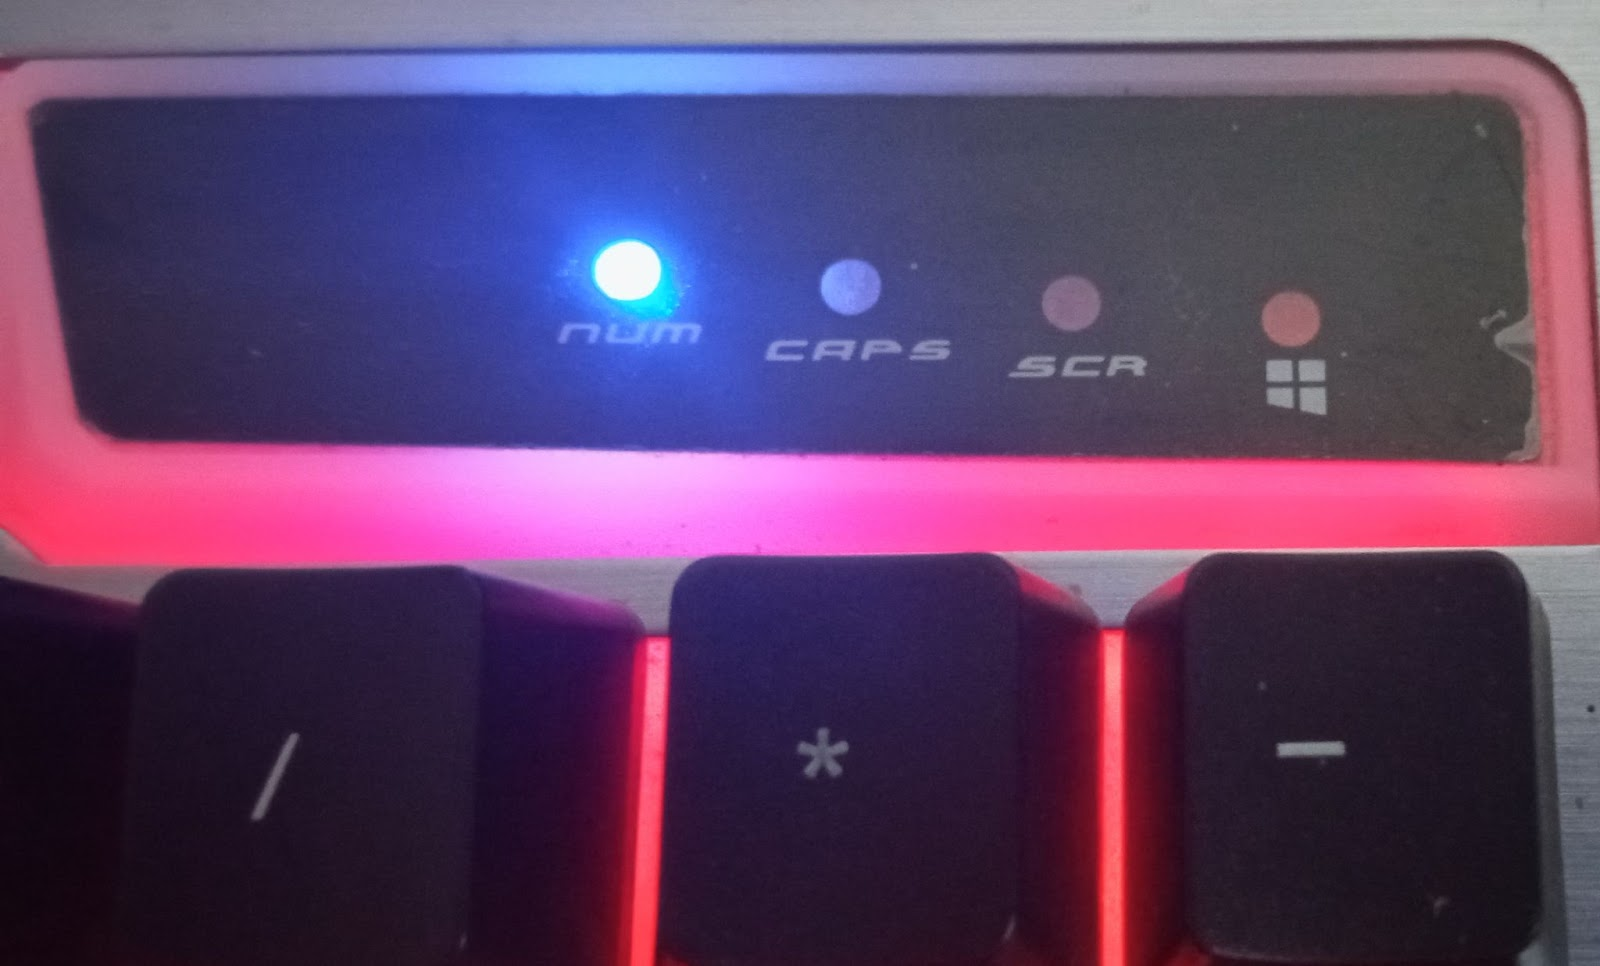 The Number Keys indication LED light on a keyboard